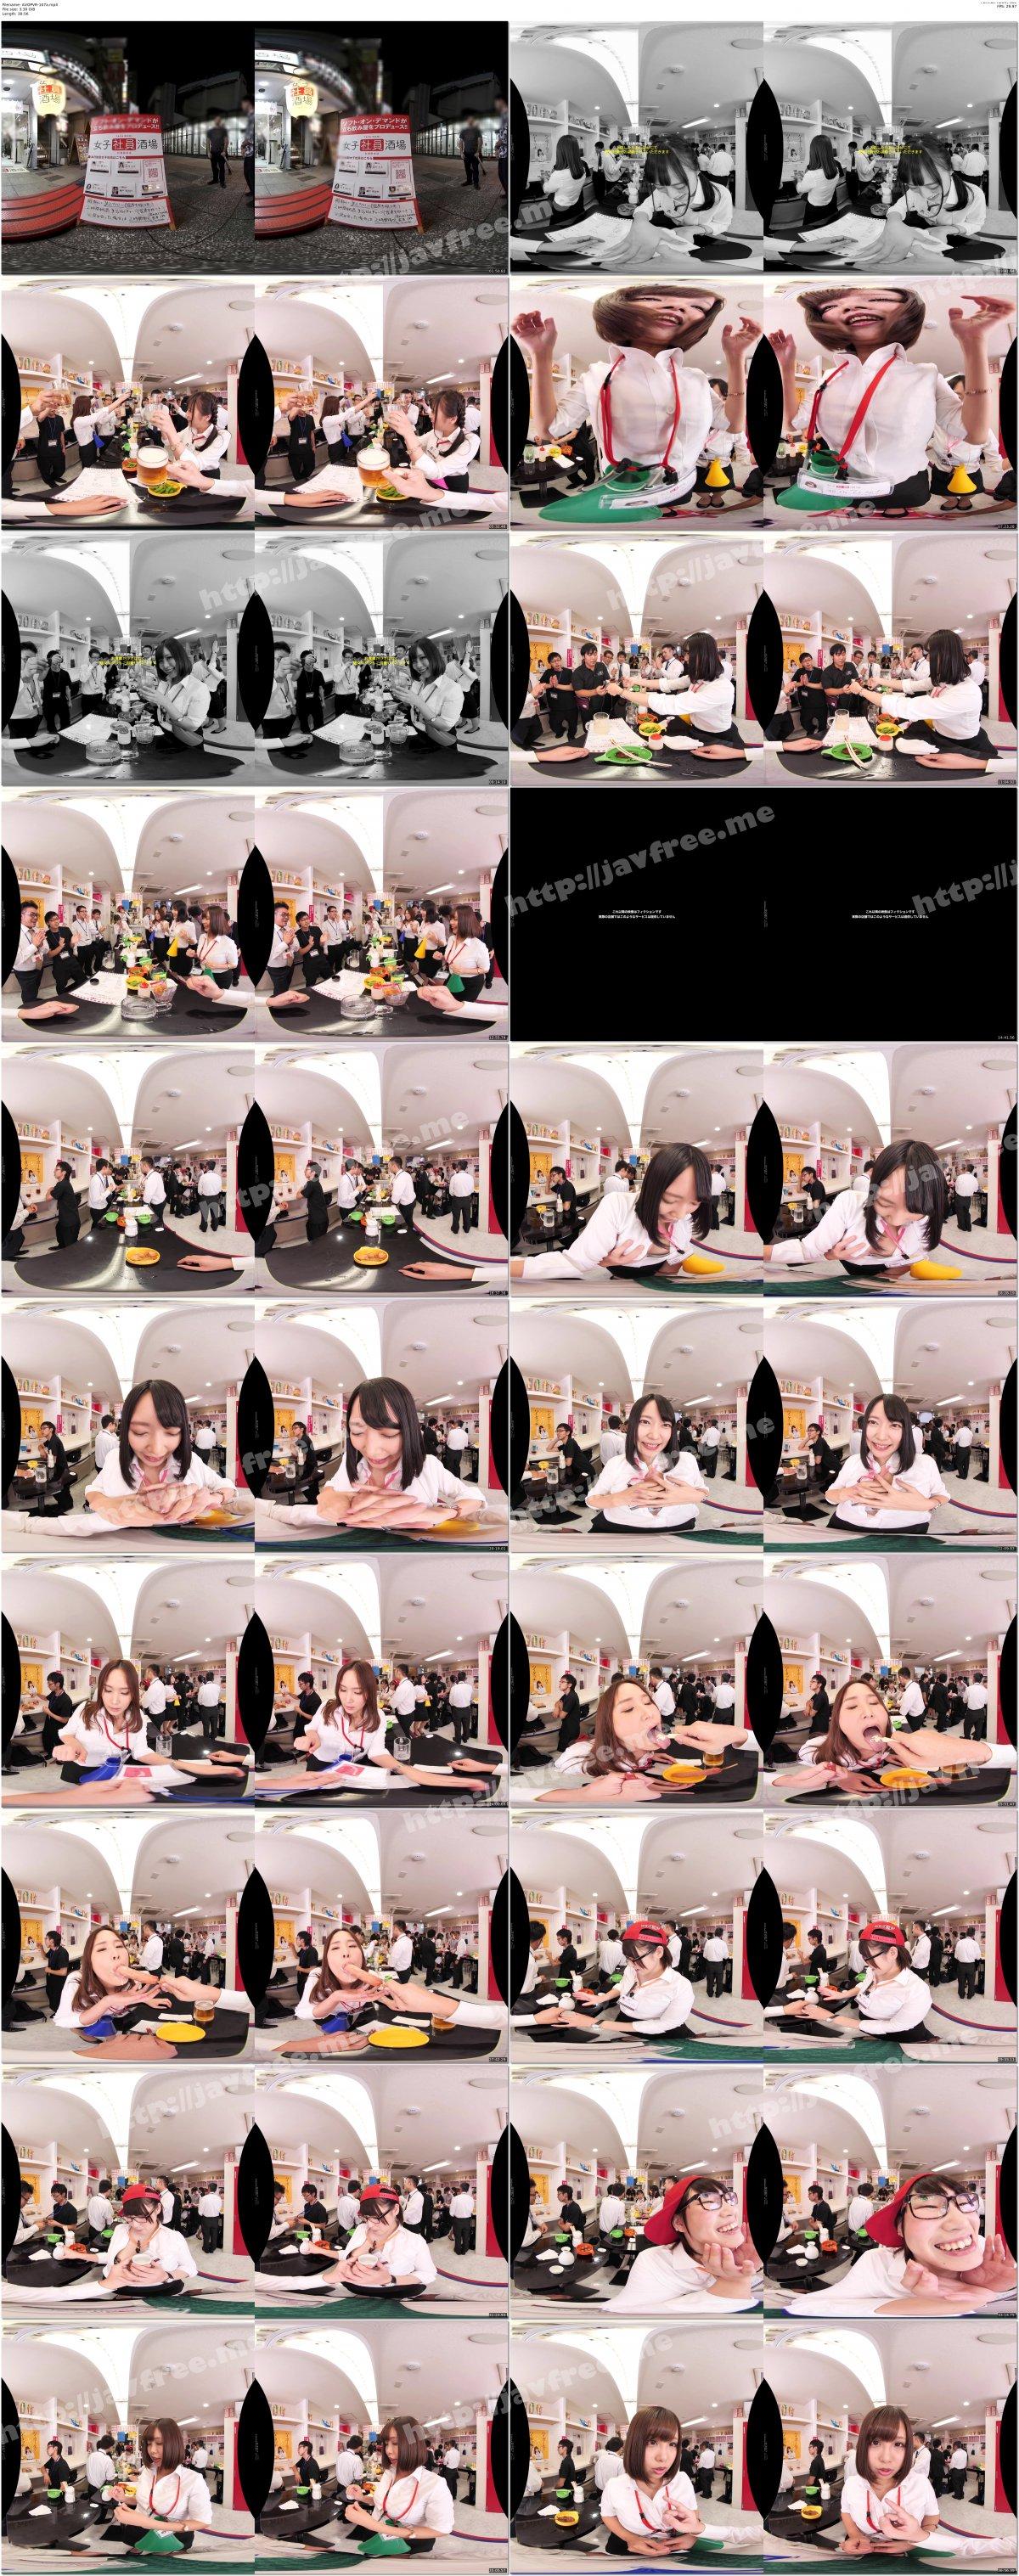 [AVOPVR-107] 【VR】女子社員酒場VR 秋葉原駅昭和通り口から徒歩15秒!絶賛話題沸騰中!噂の行列の出来る立ち飲み屋!【バーチャル】と 【リアル】の融合!実際に出勤しているSOD女子社員とVRでヤれる!会ってからヤるか?ヤってから会うか!?